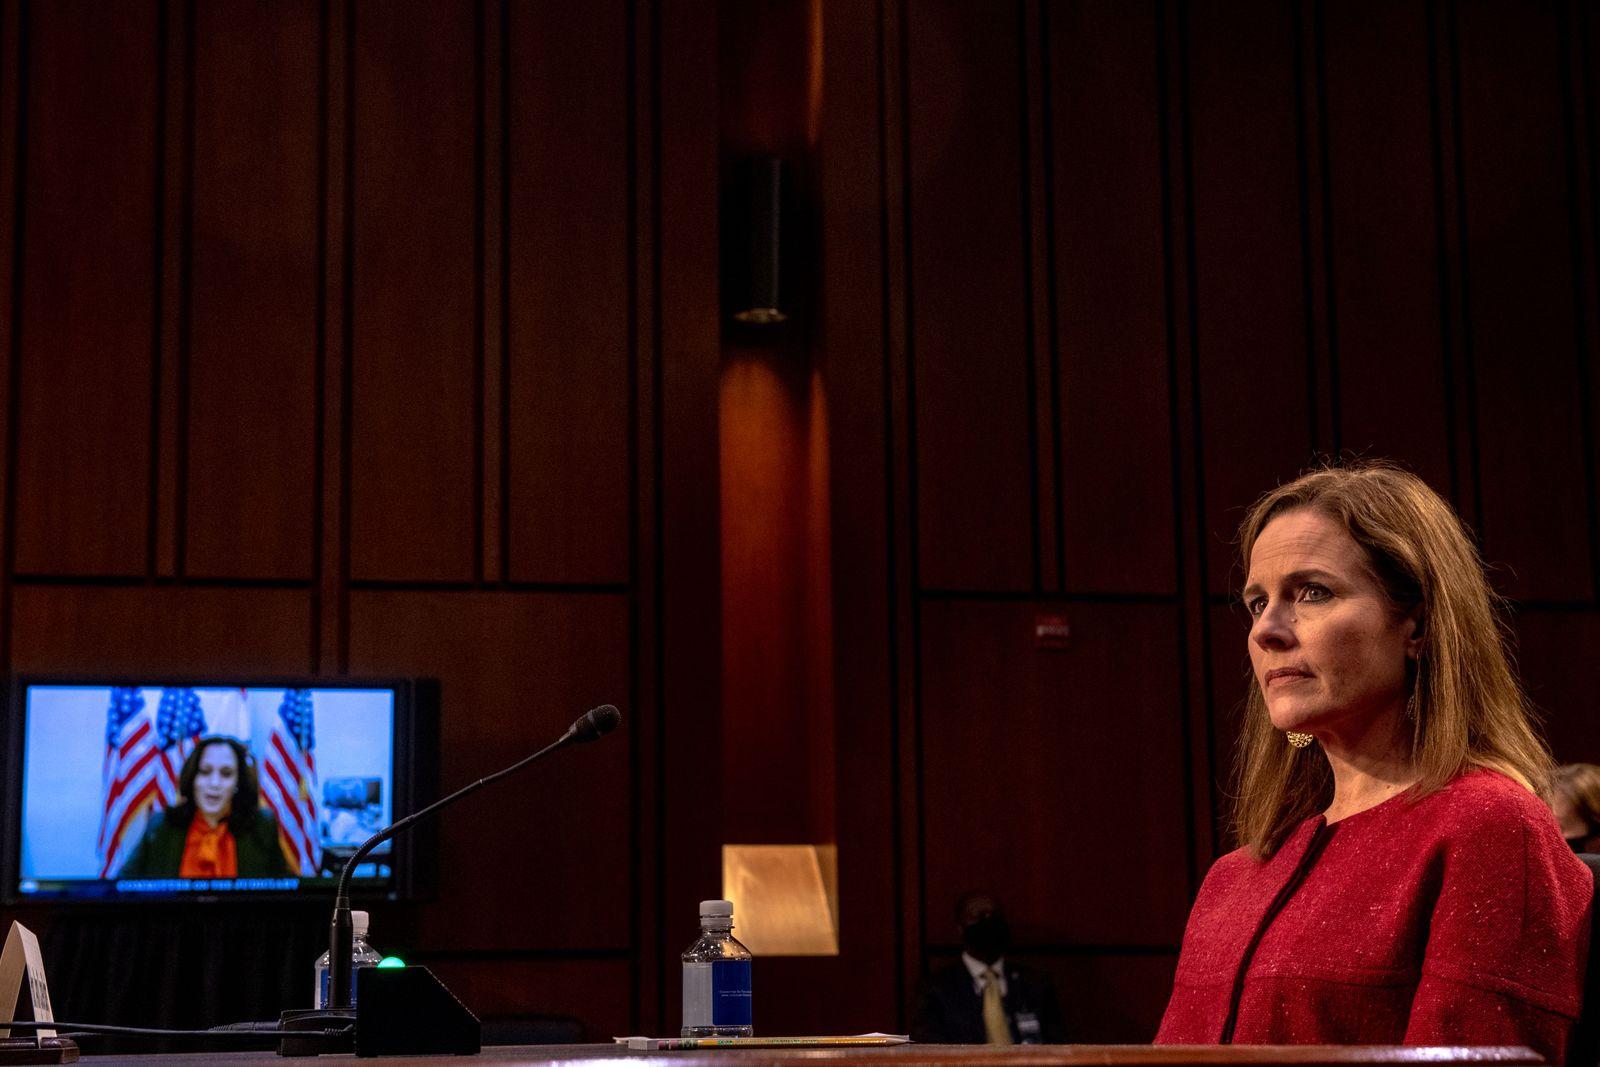 Senate confirmation hearings on Supreme Court nominee Coney Barrett